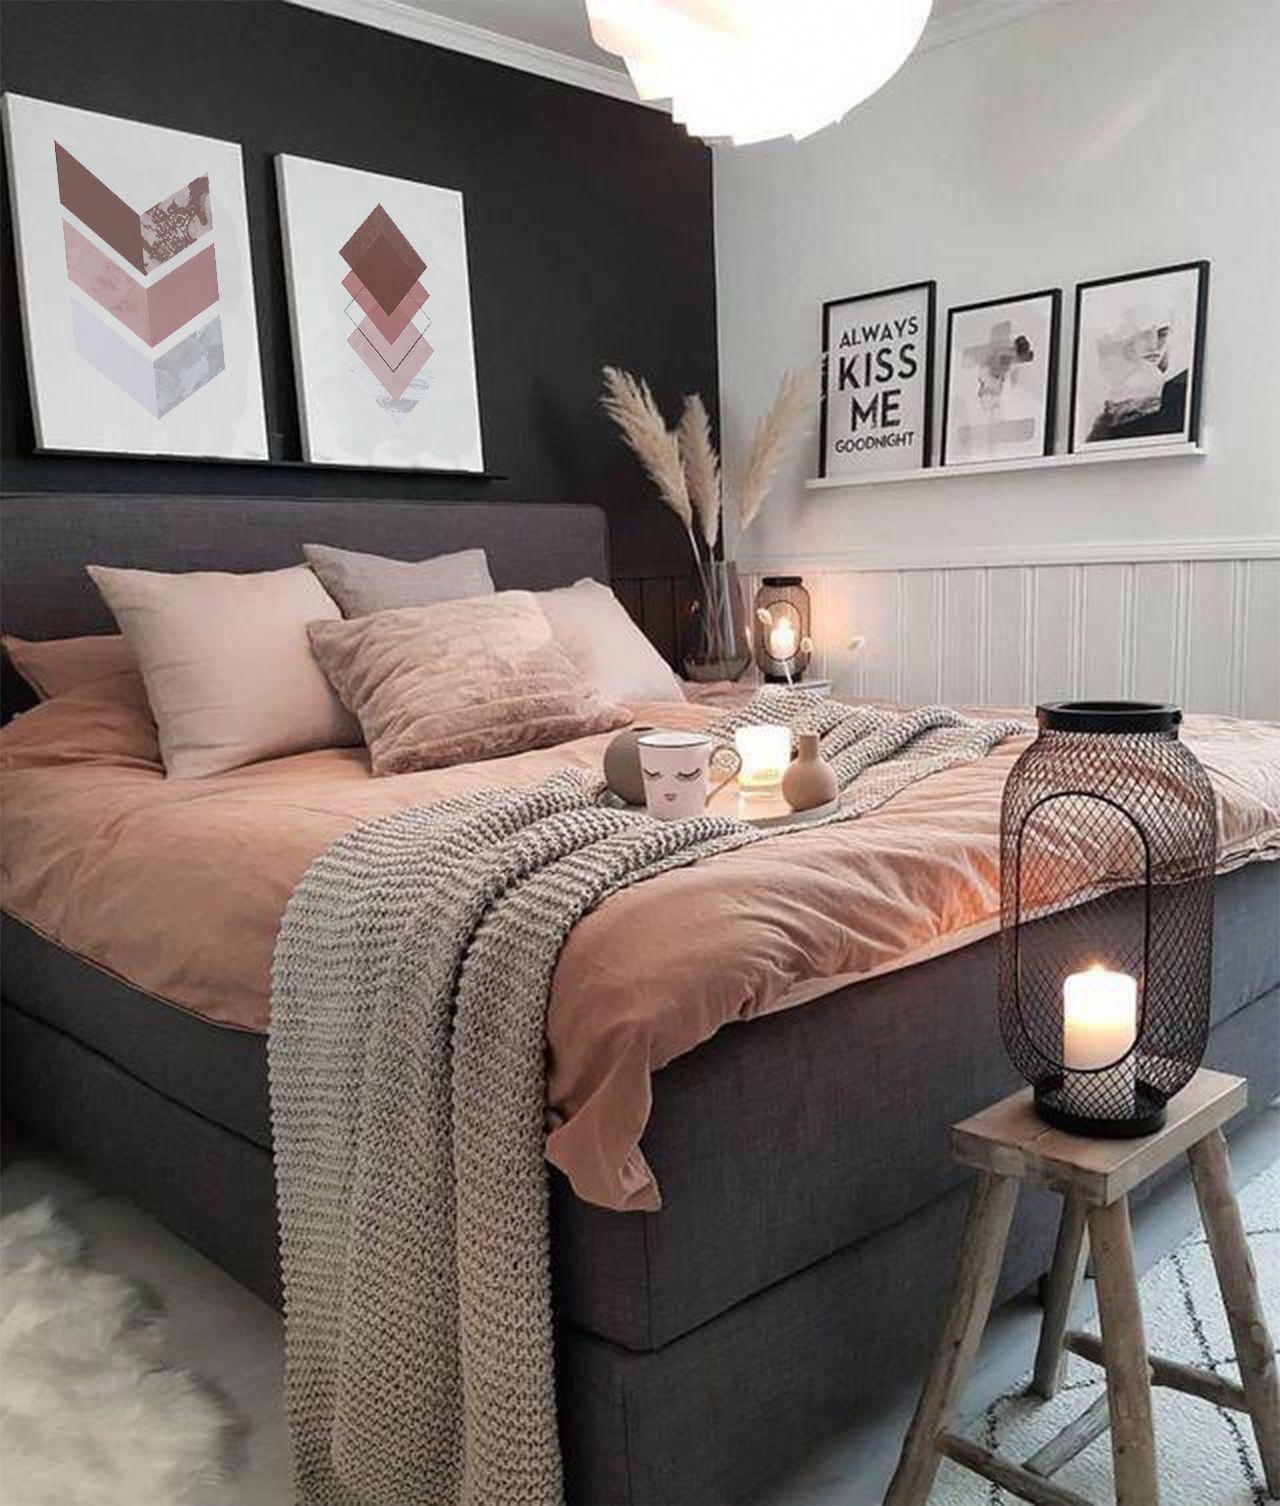 Burgundy&Grey Geometric Art Print, Geometry Art, Minimalism, Abstract Poster, Set of Three Prints, Set 3 Prints, Bedroom Wall Art, Above Bed